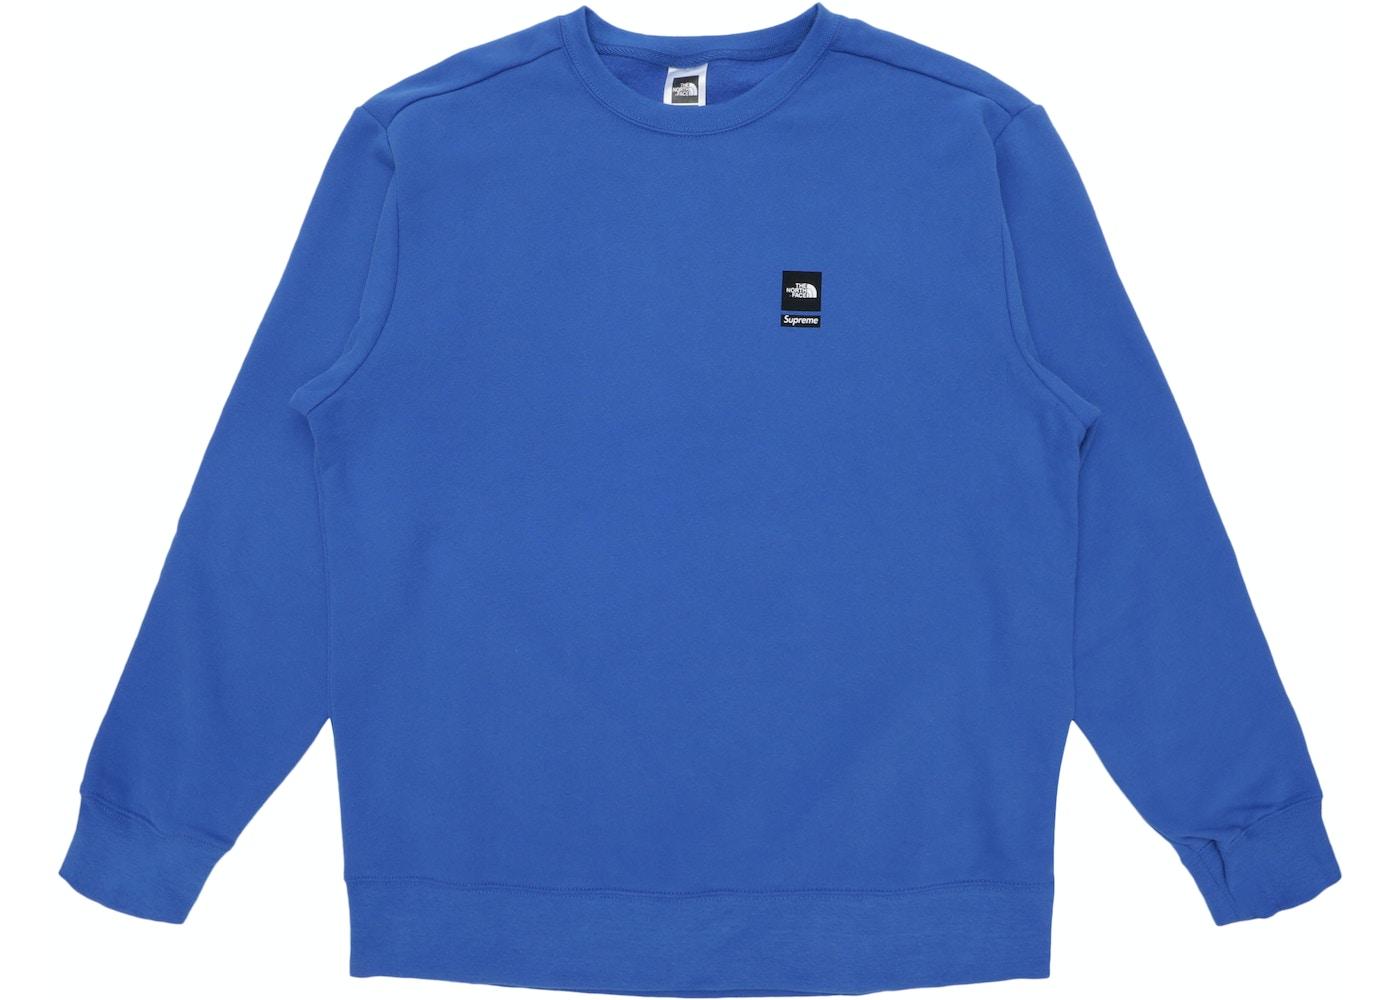 0bb8c4902 Supreme The North Face Mountain Crewneck Sweatshirt Royal